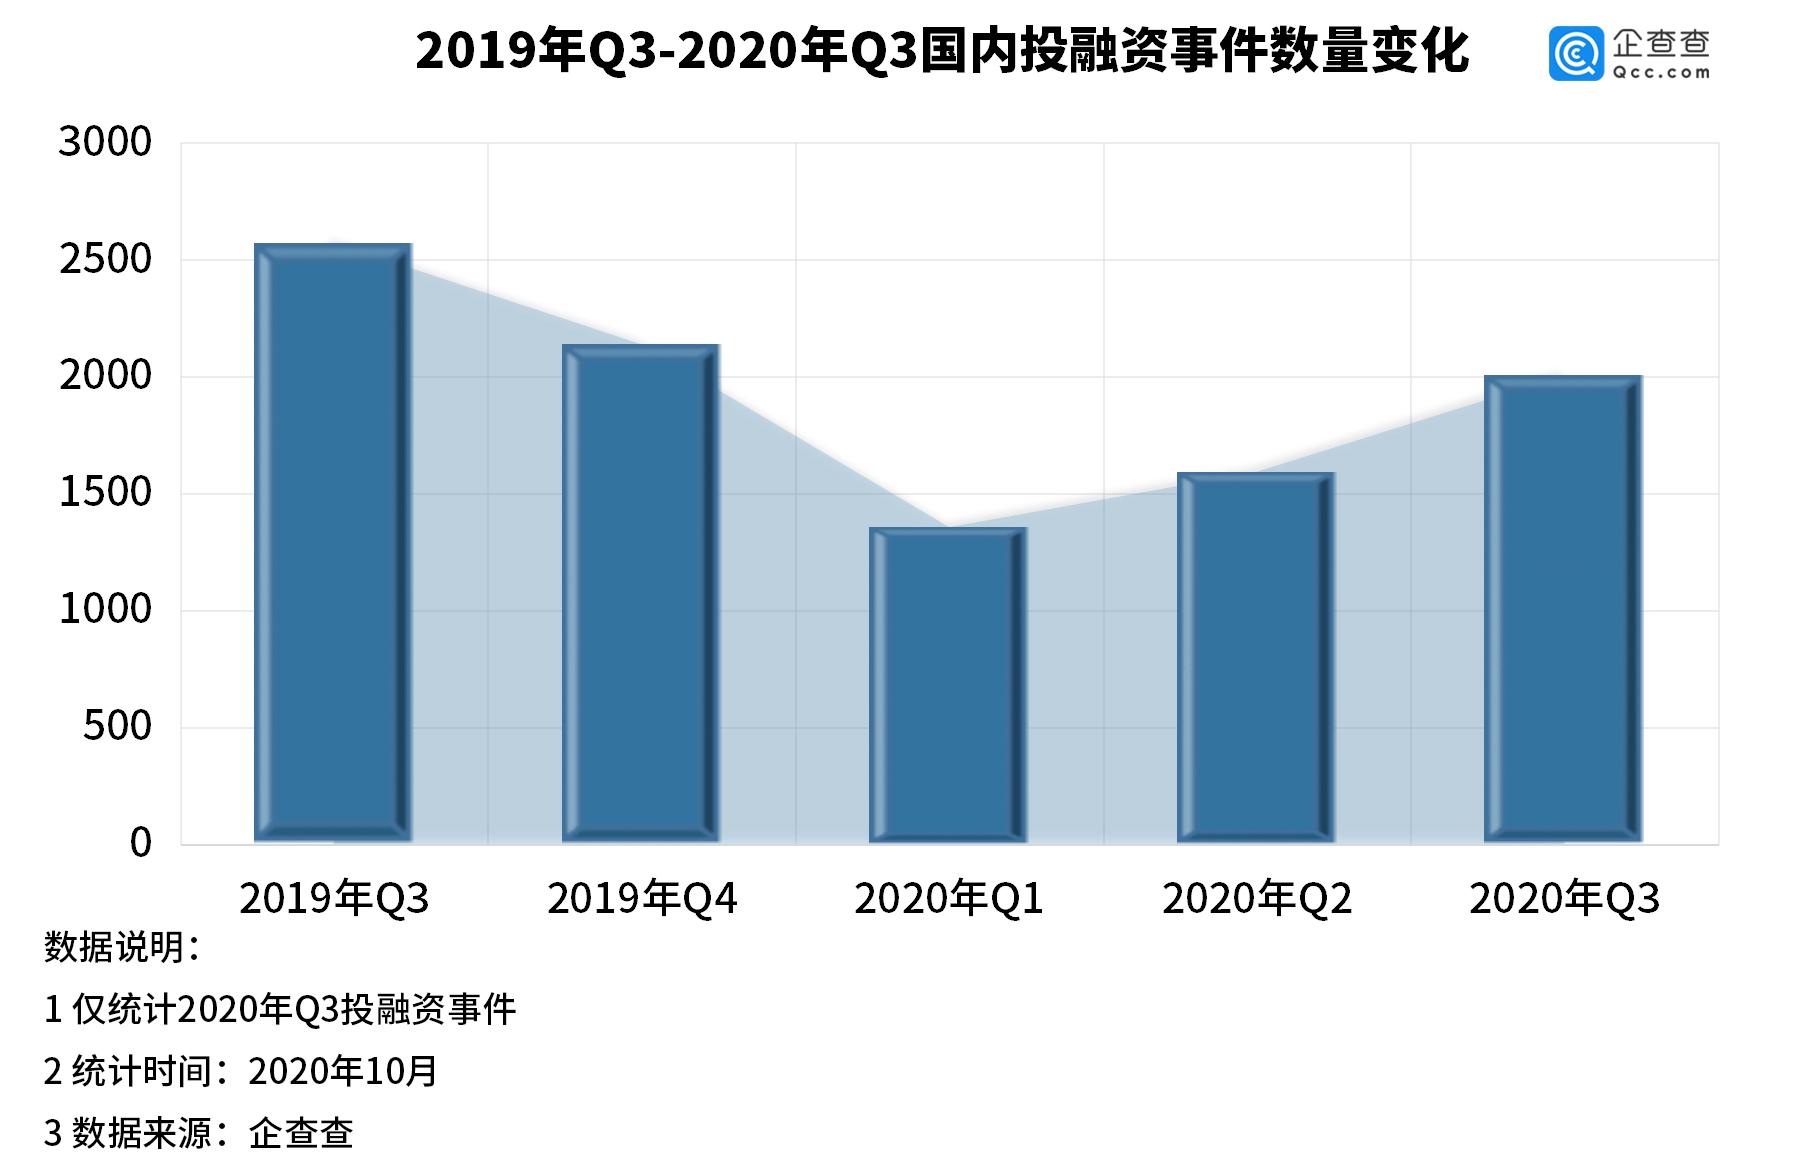 <strong>第三季度中国投融资环比增长25.93% 医疗、制造和硬件变得流行</strong>